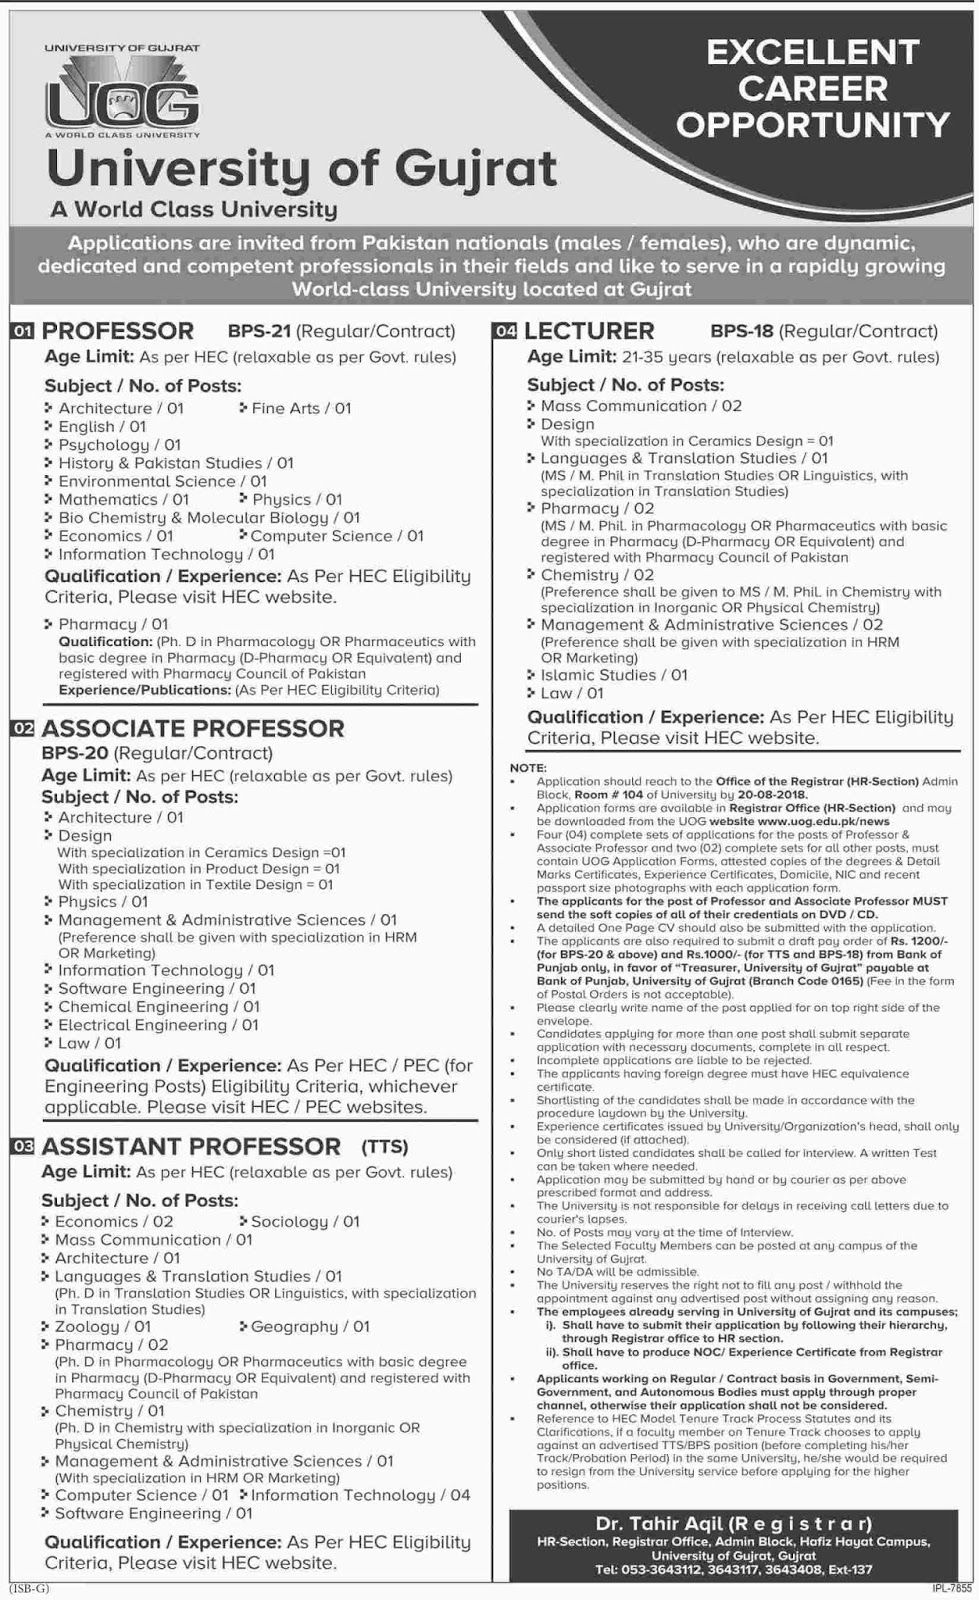 Latest Jobs in UOG, University of Gujarat August 2018